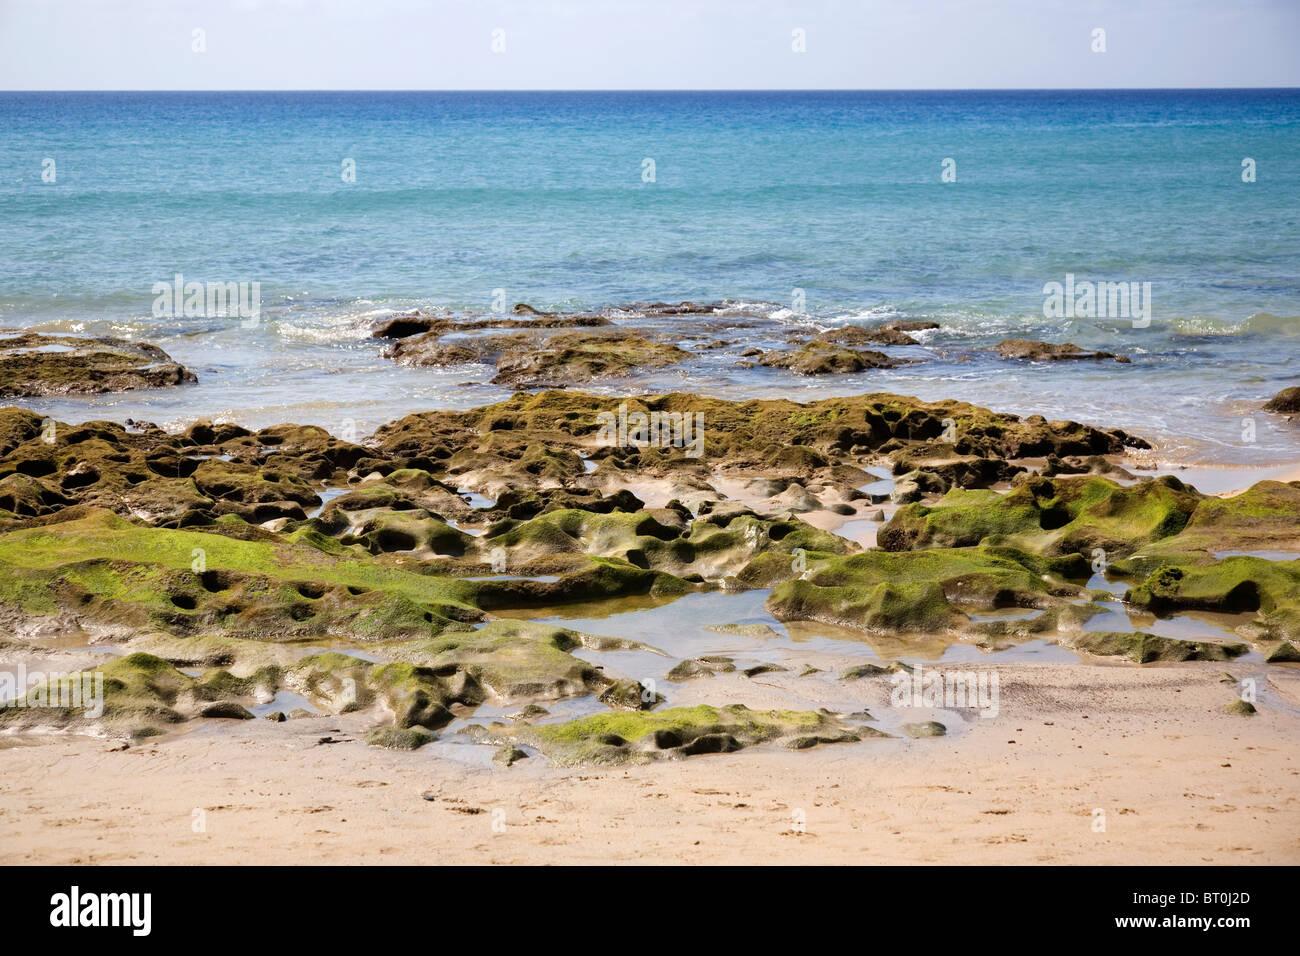 Beach shore at Porto Santo Beach - Madeira - Stock Image